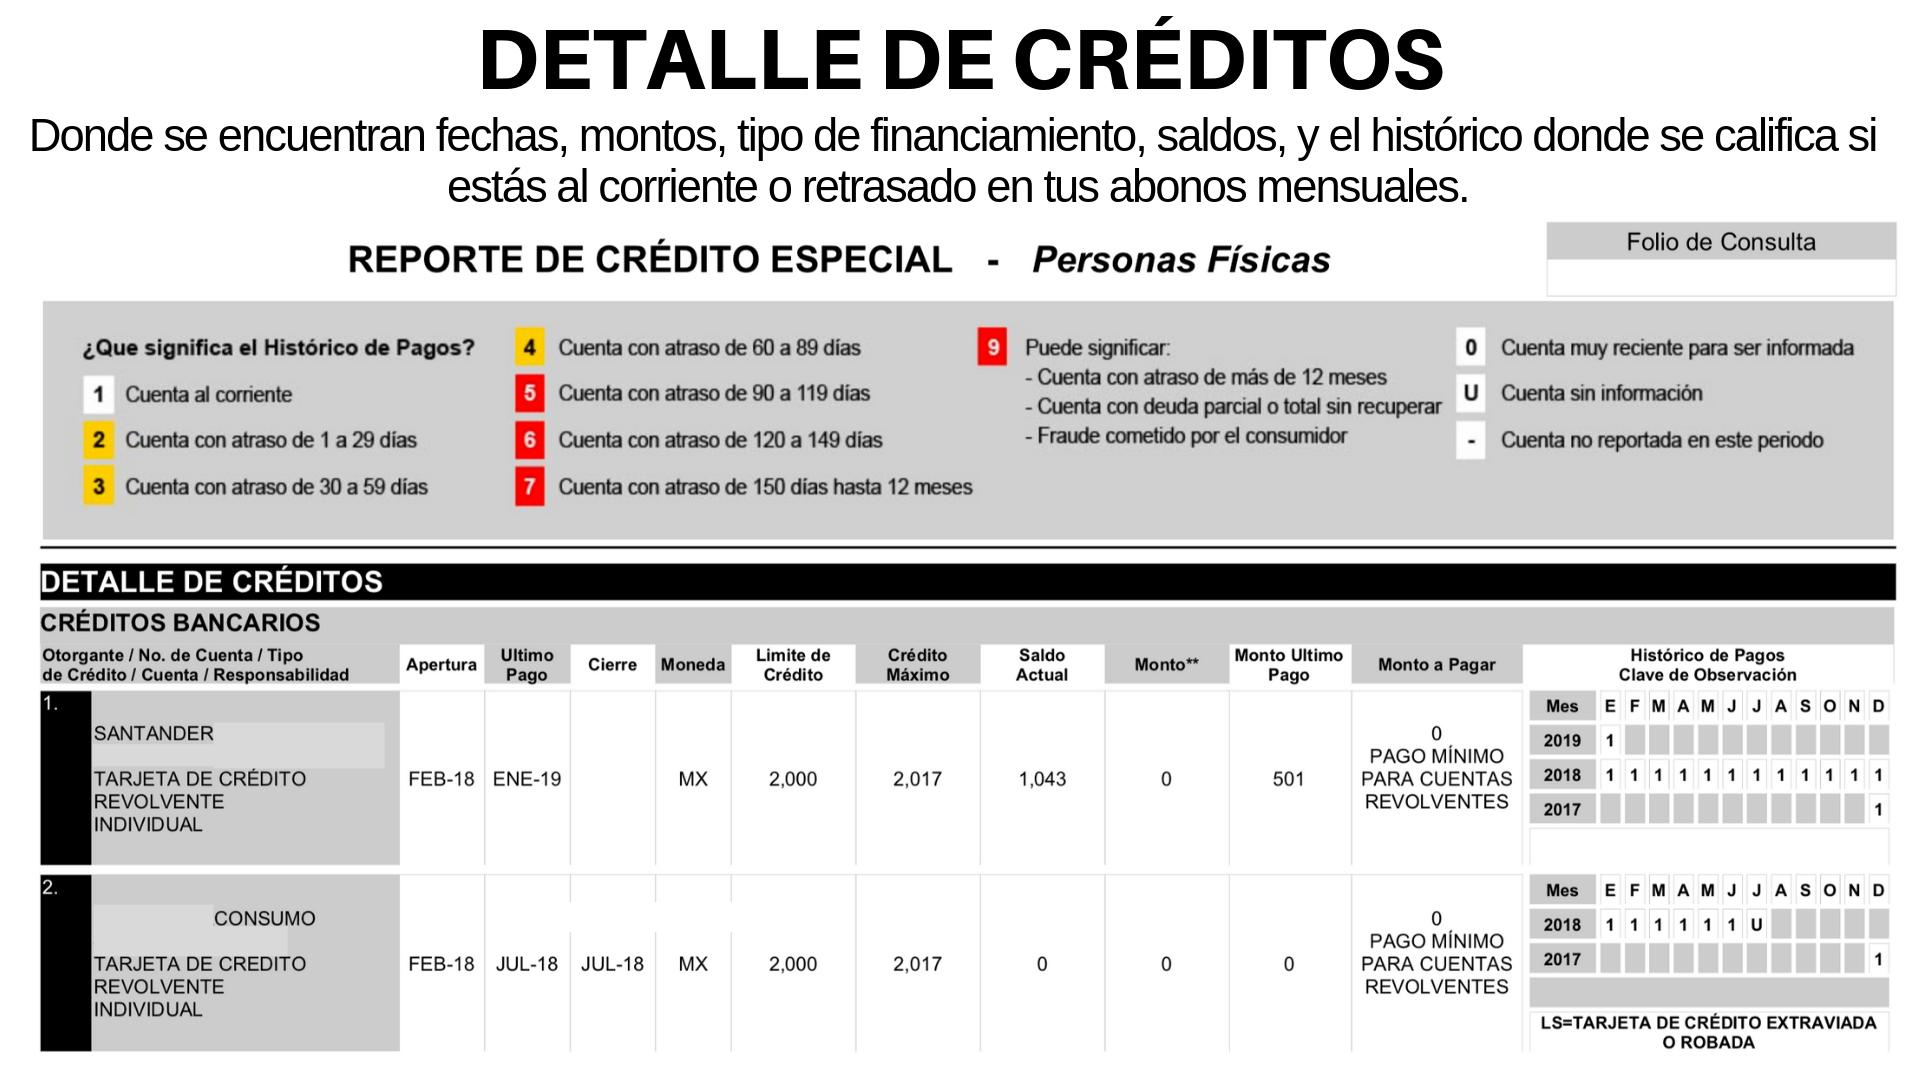 Detalle de créditos - reporte de crédito especial